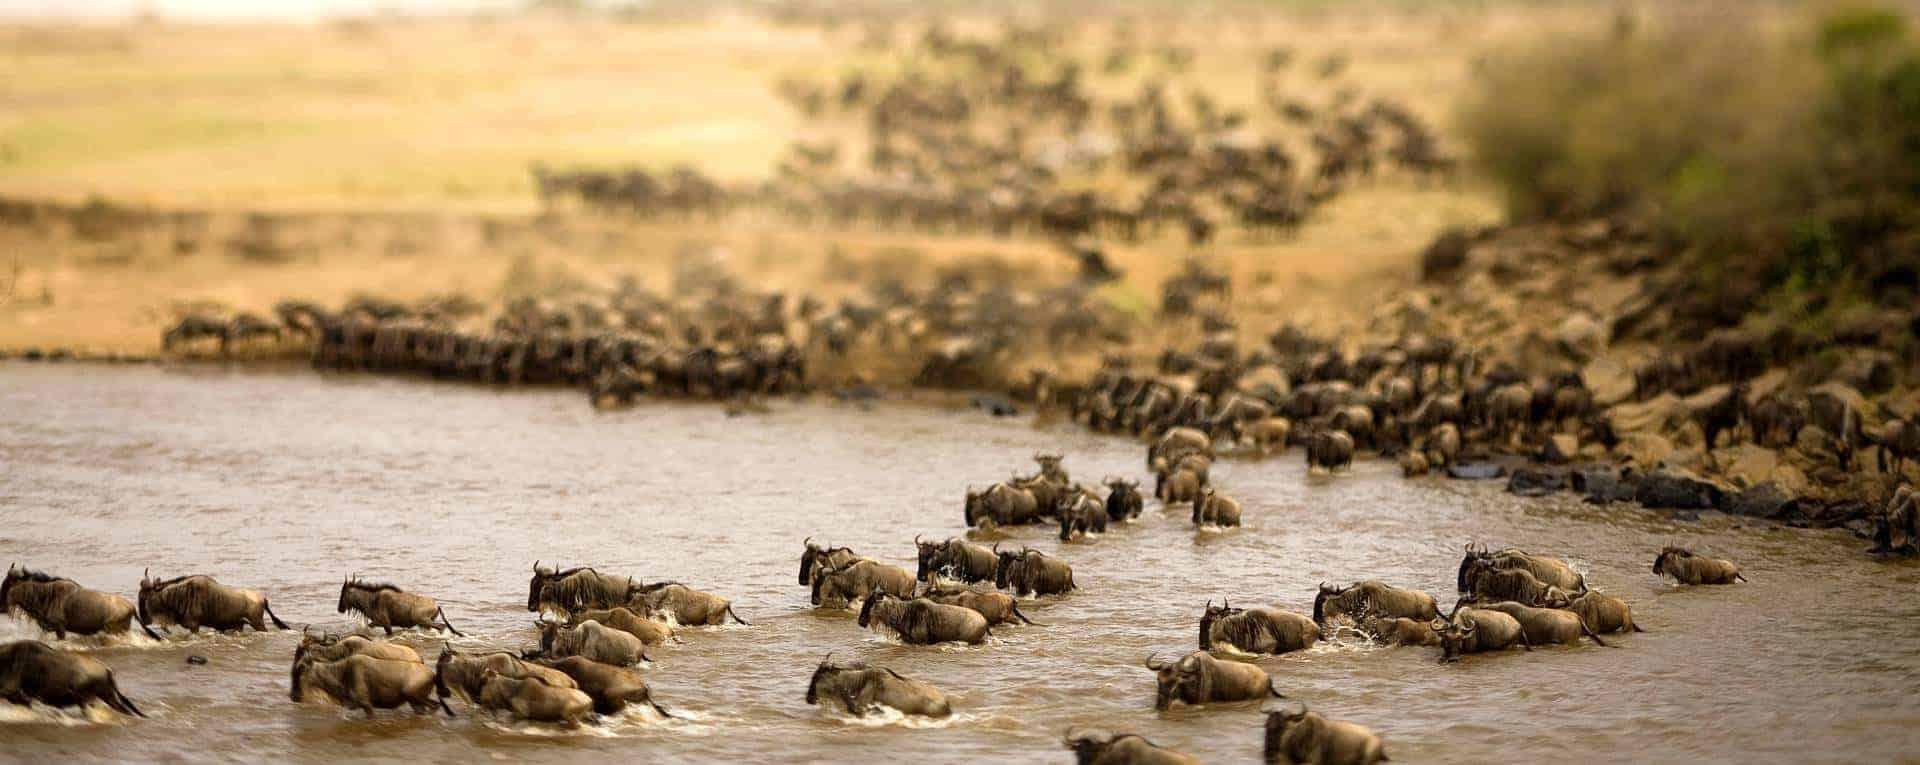 7 days Serengeti and Zanzibar safari